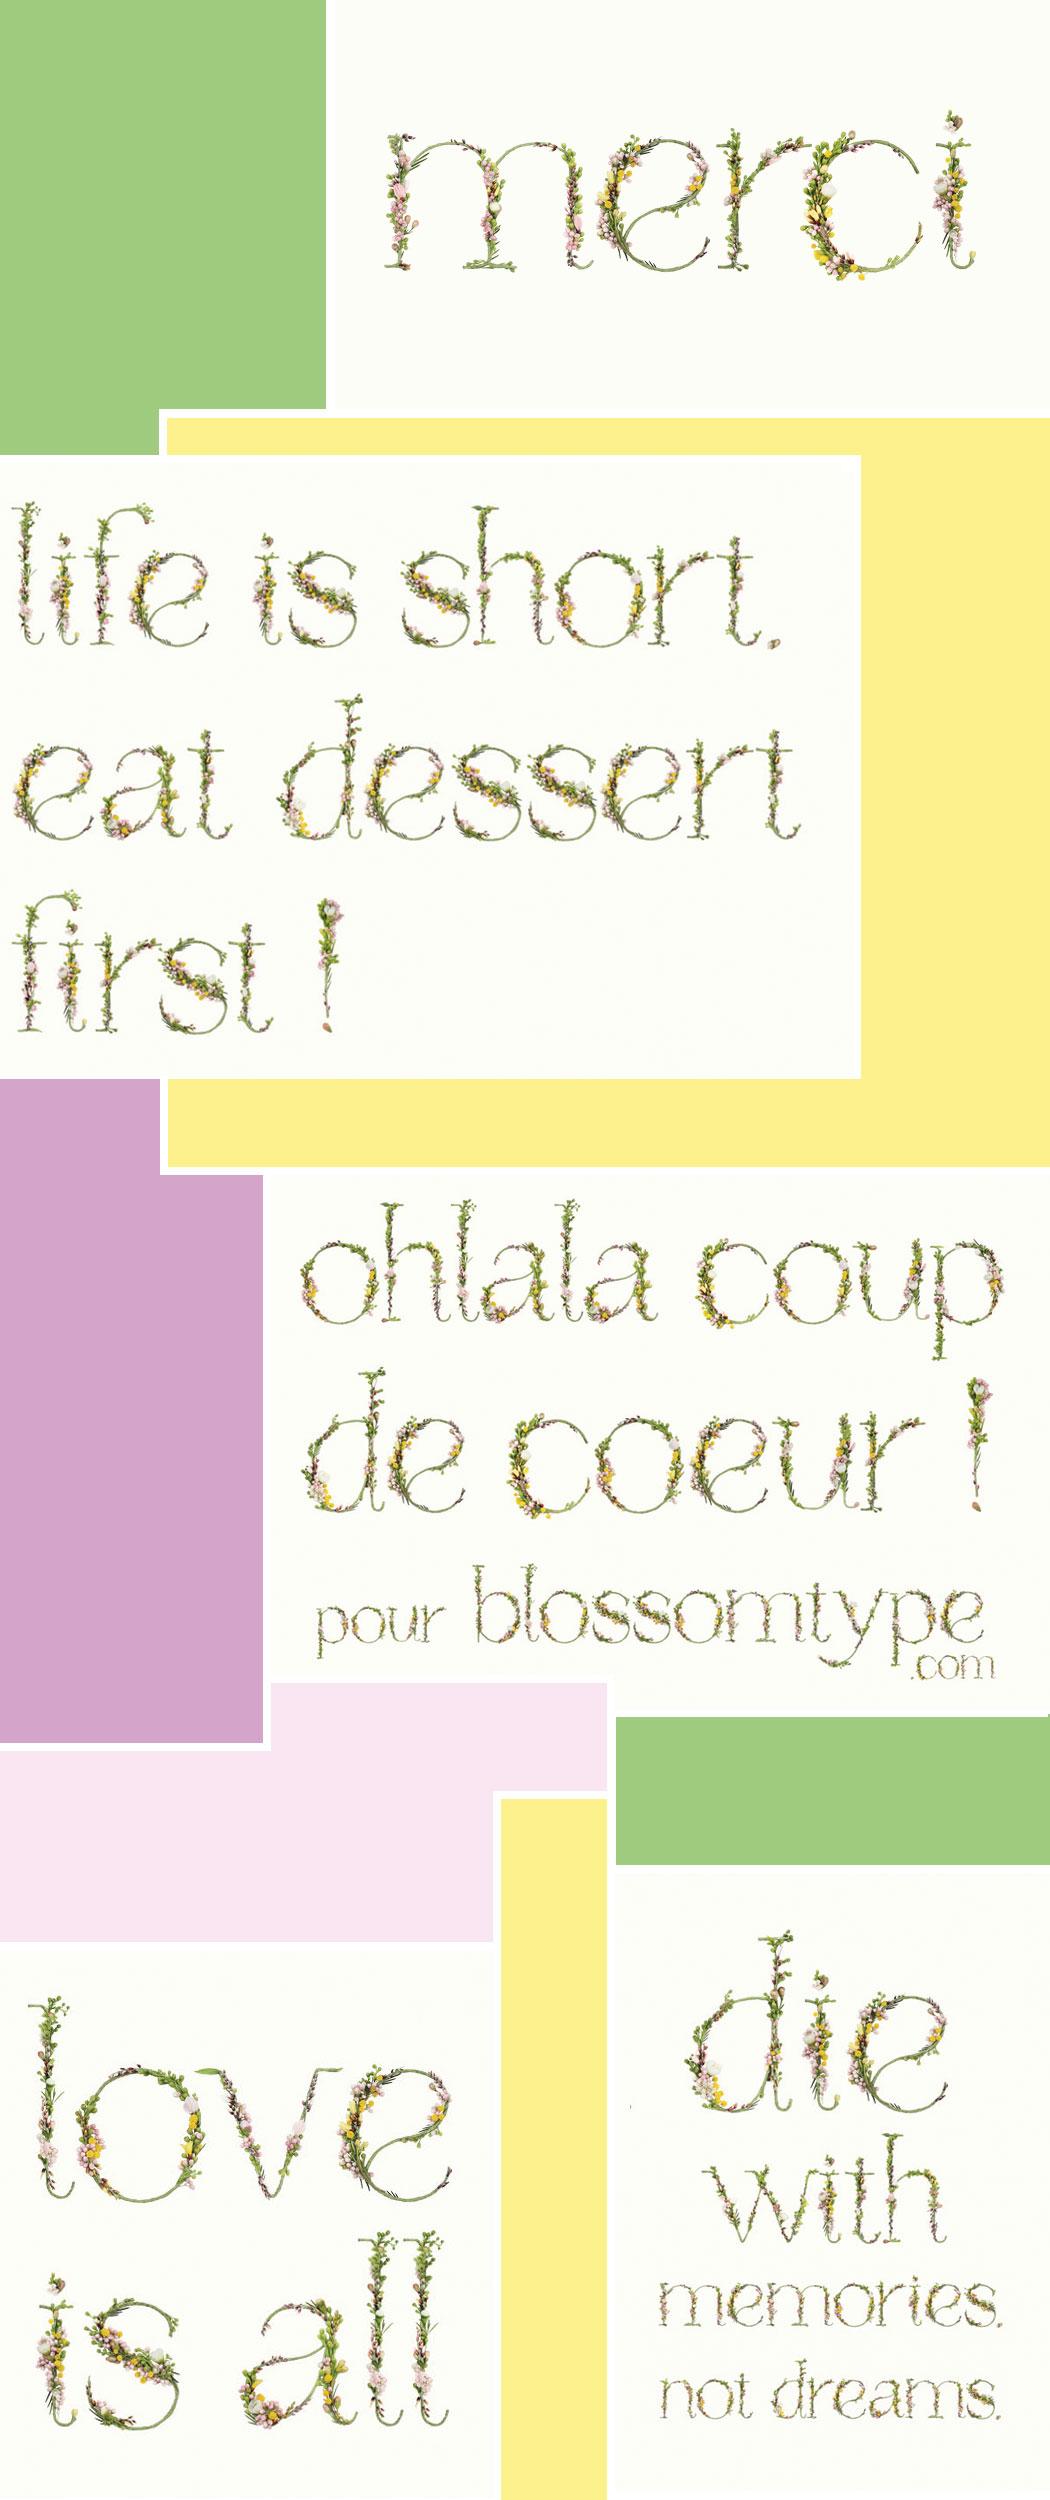 Blossomtype_compo_jesussauvage